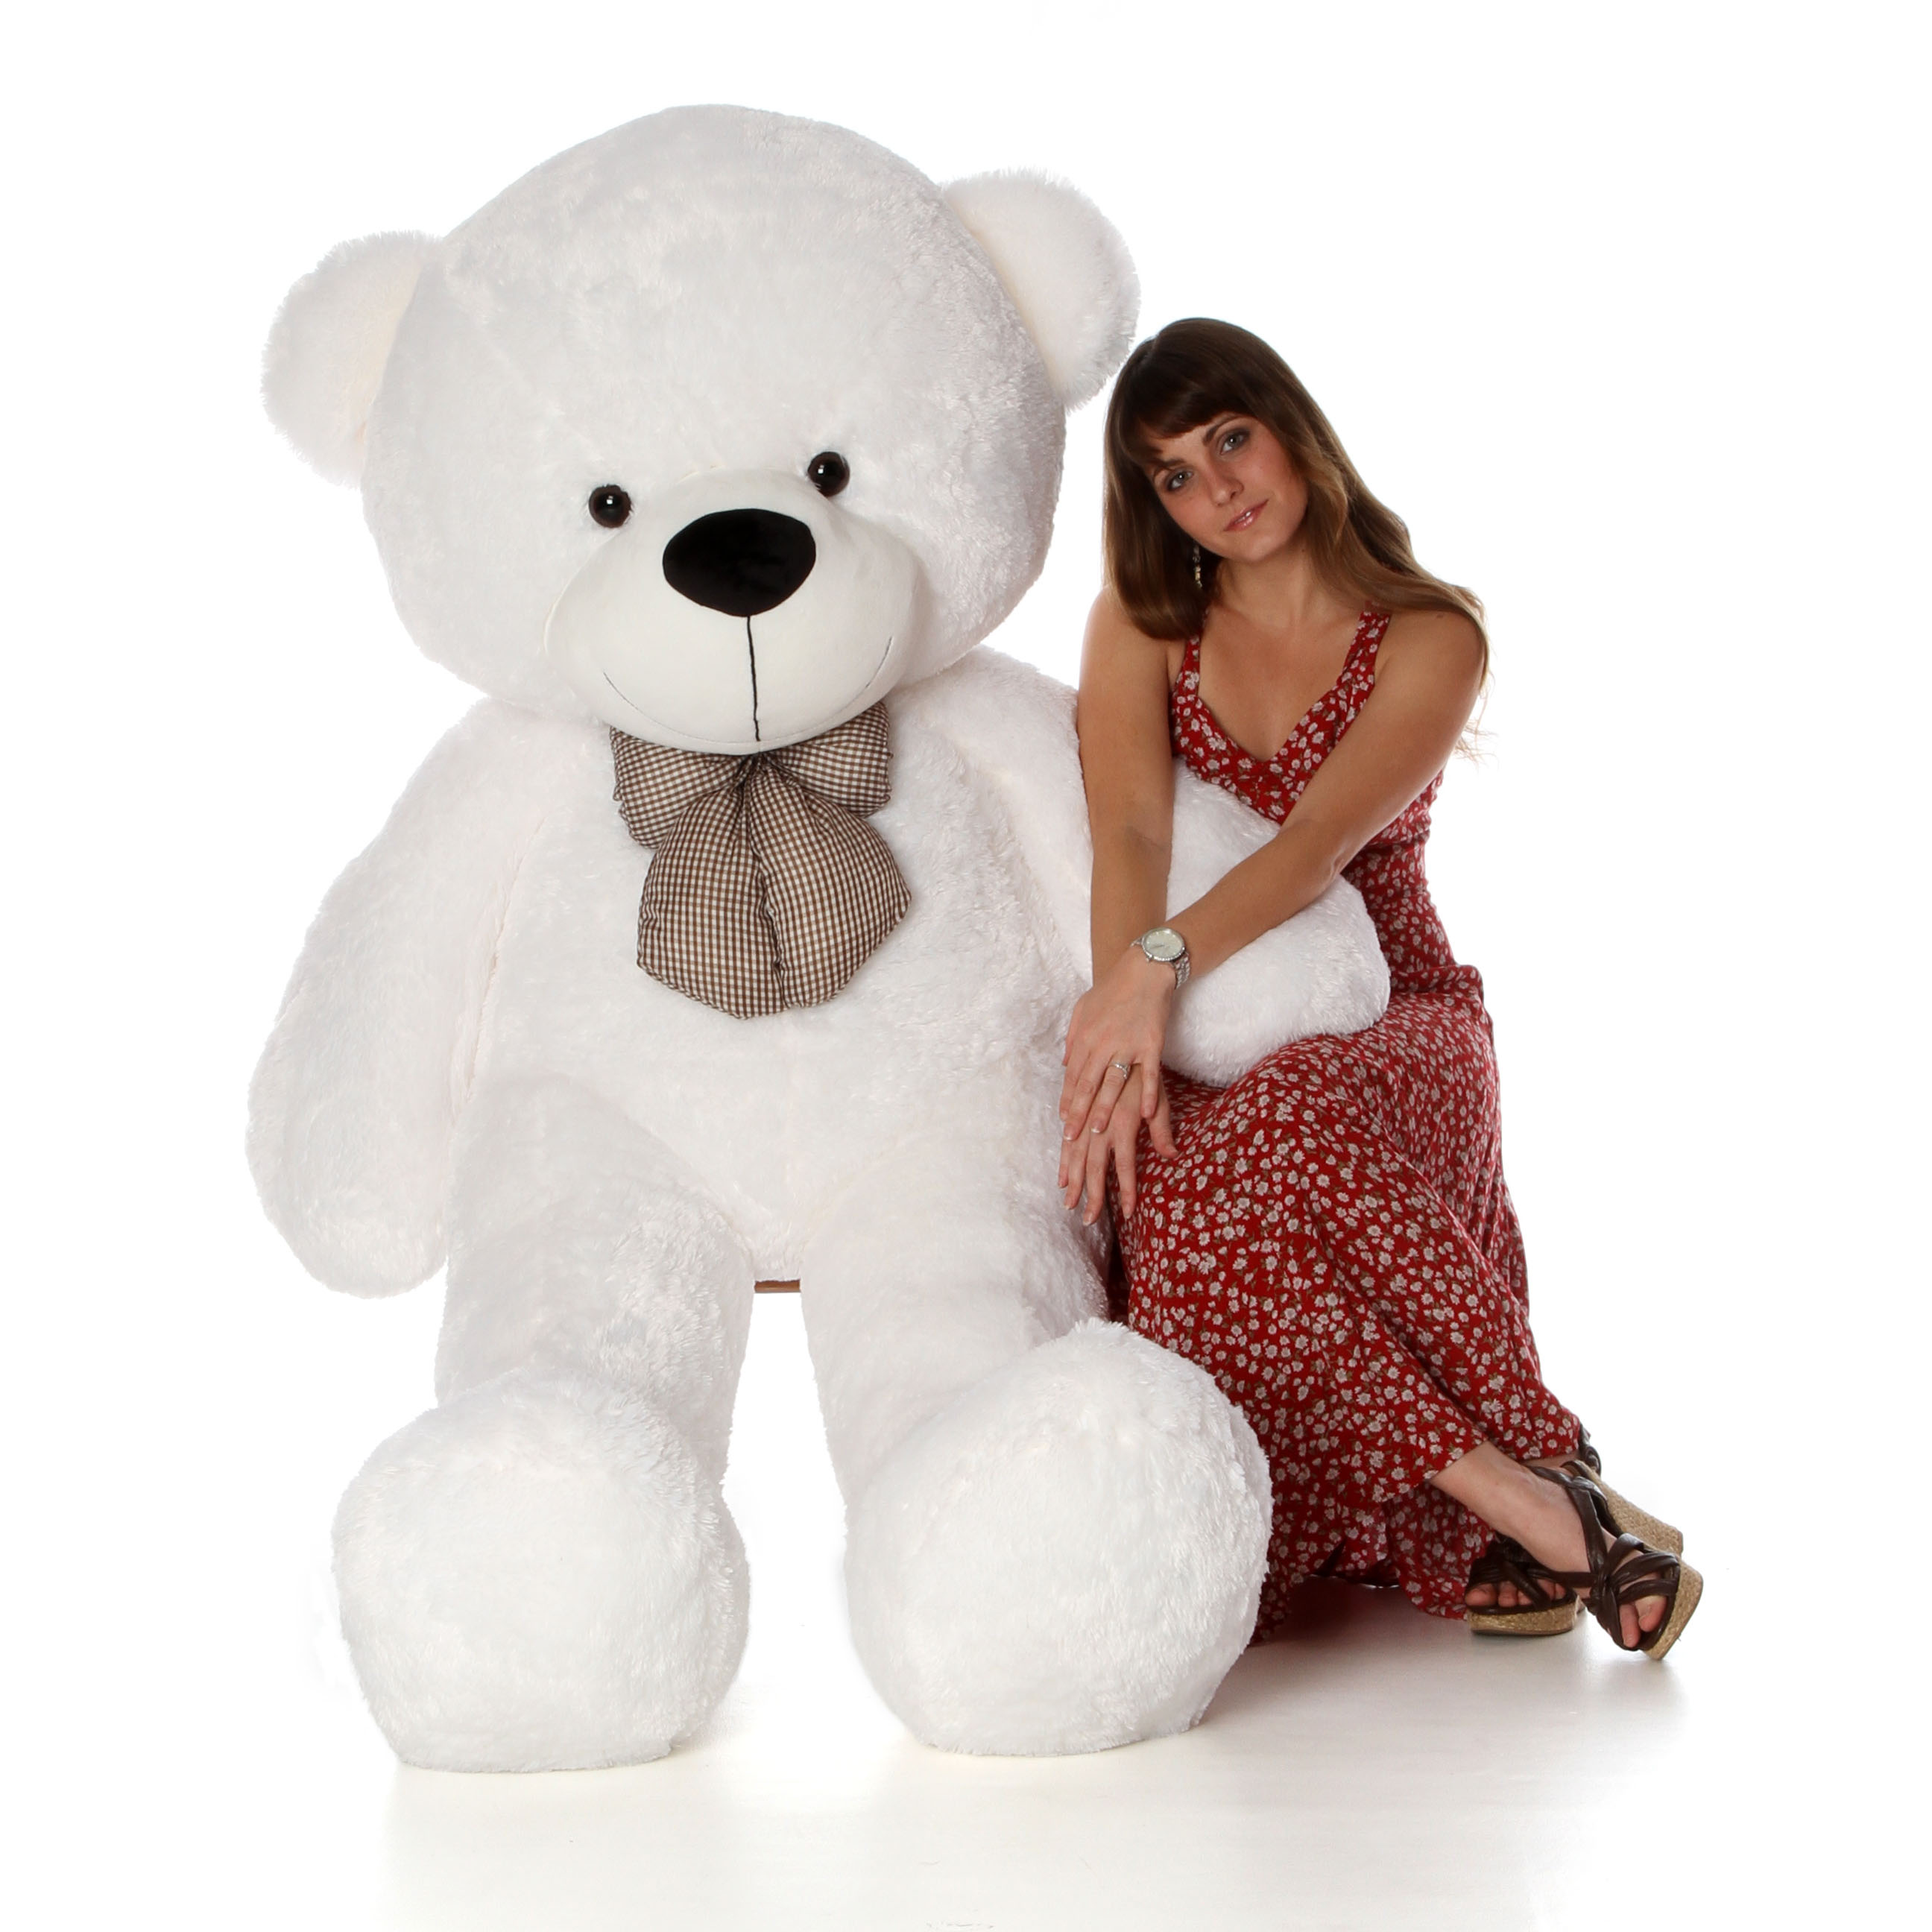 6ft-best-selling-life-size-teddy-bear-coco-cuddles-giant-white-teddy-bear.jpg